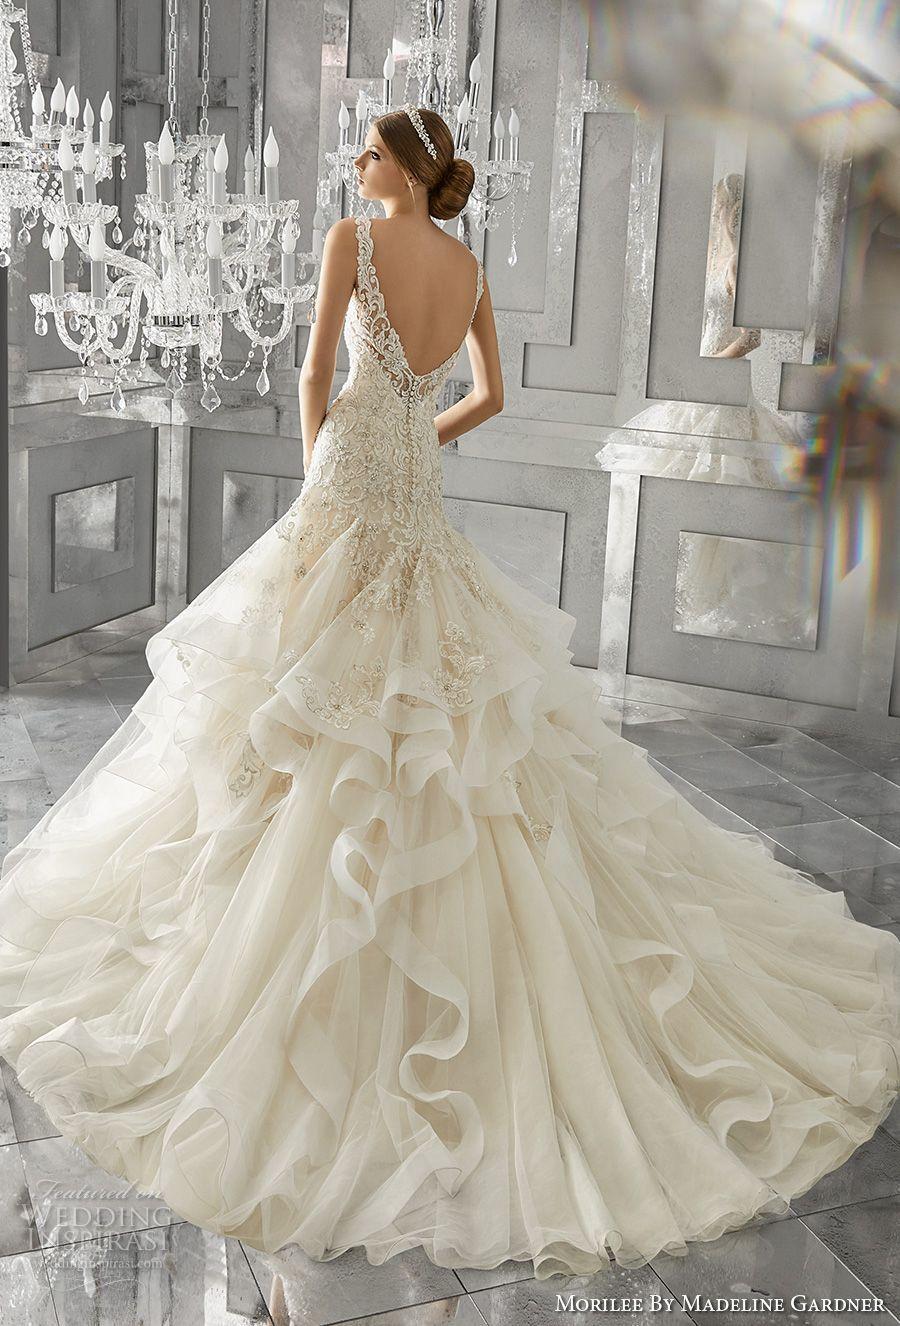 Morilee by madeline gardner fall wedding dresses chapel train